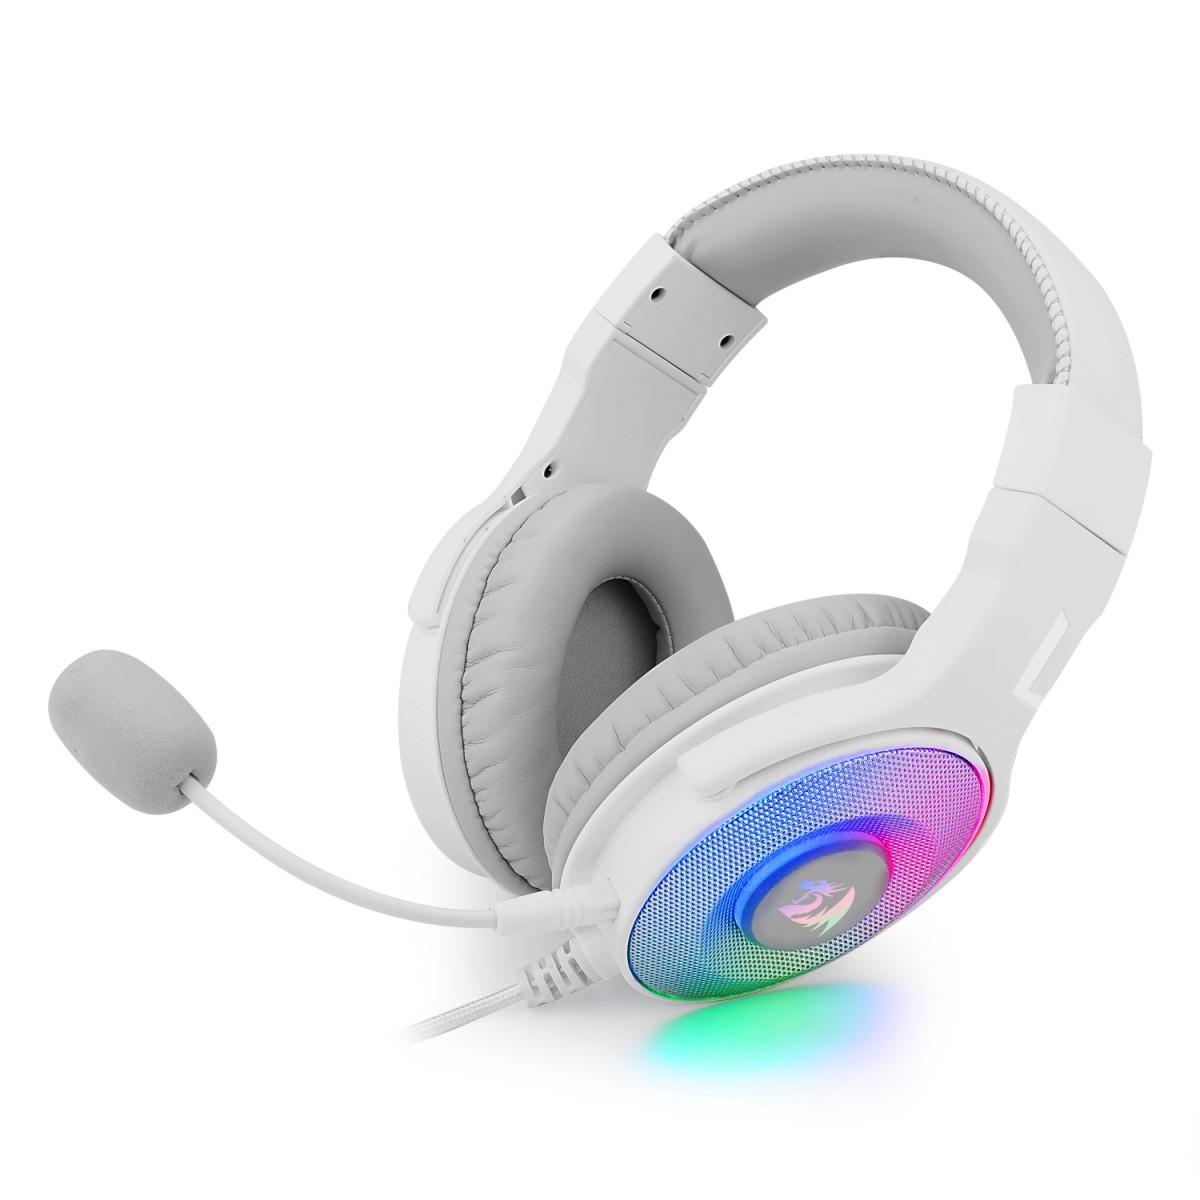 Headset Gamer Redragon, Pandora 2 White, RGB, USB + 3.5mm, Microfone Destacável, H350W-RGB-1